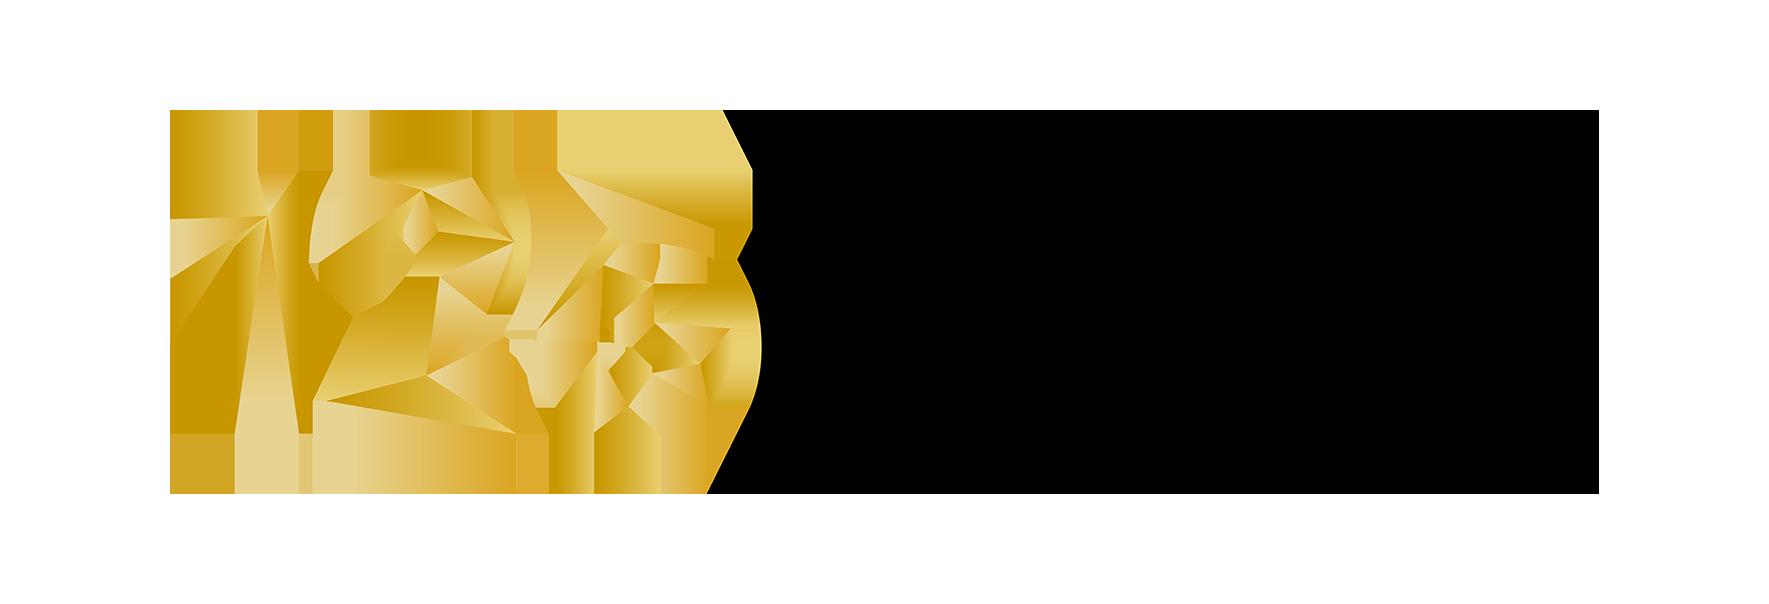 125 Jahre ŠKODA Logo